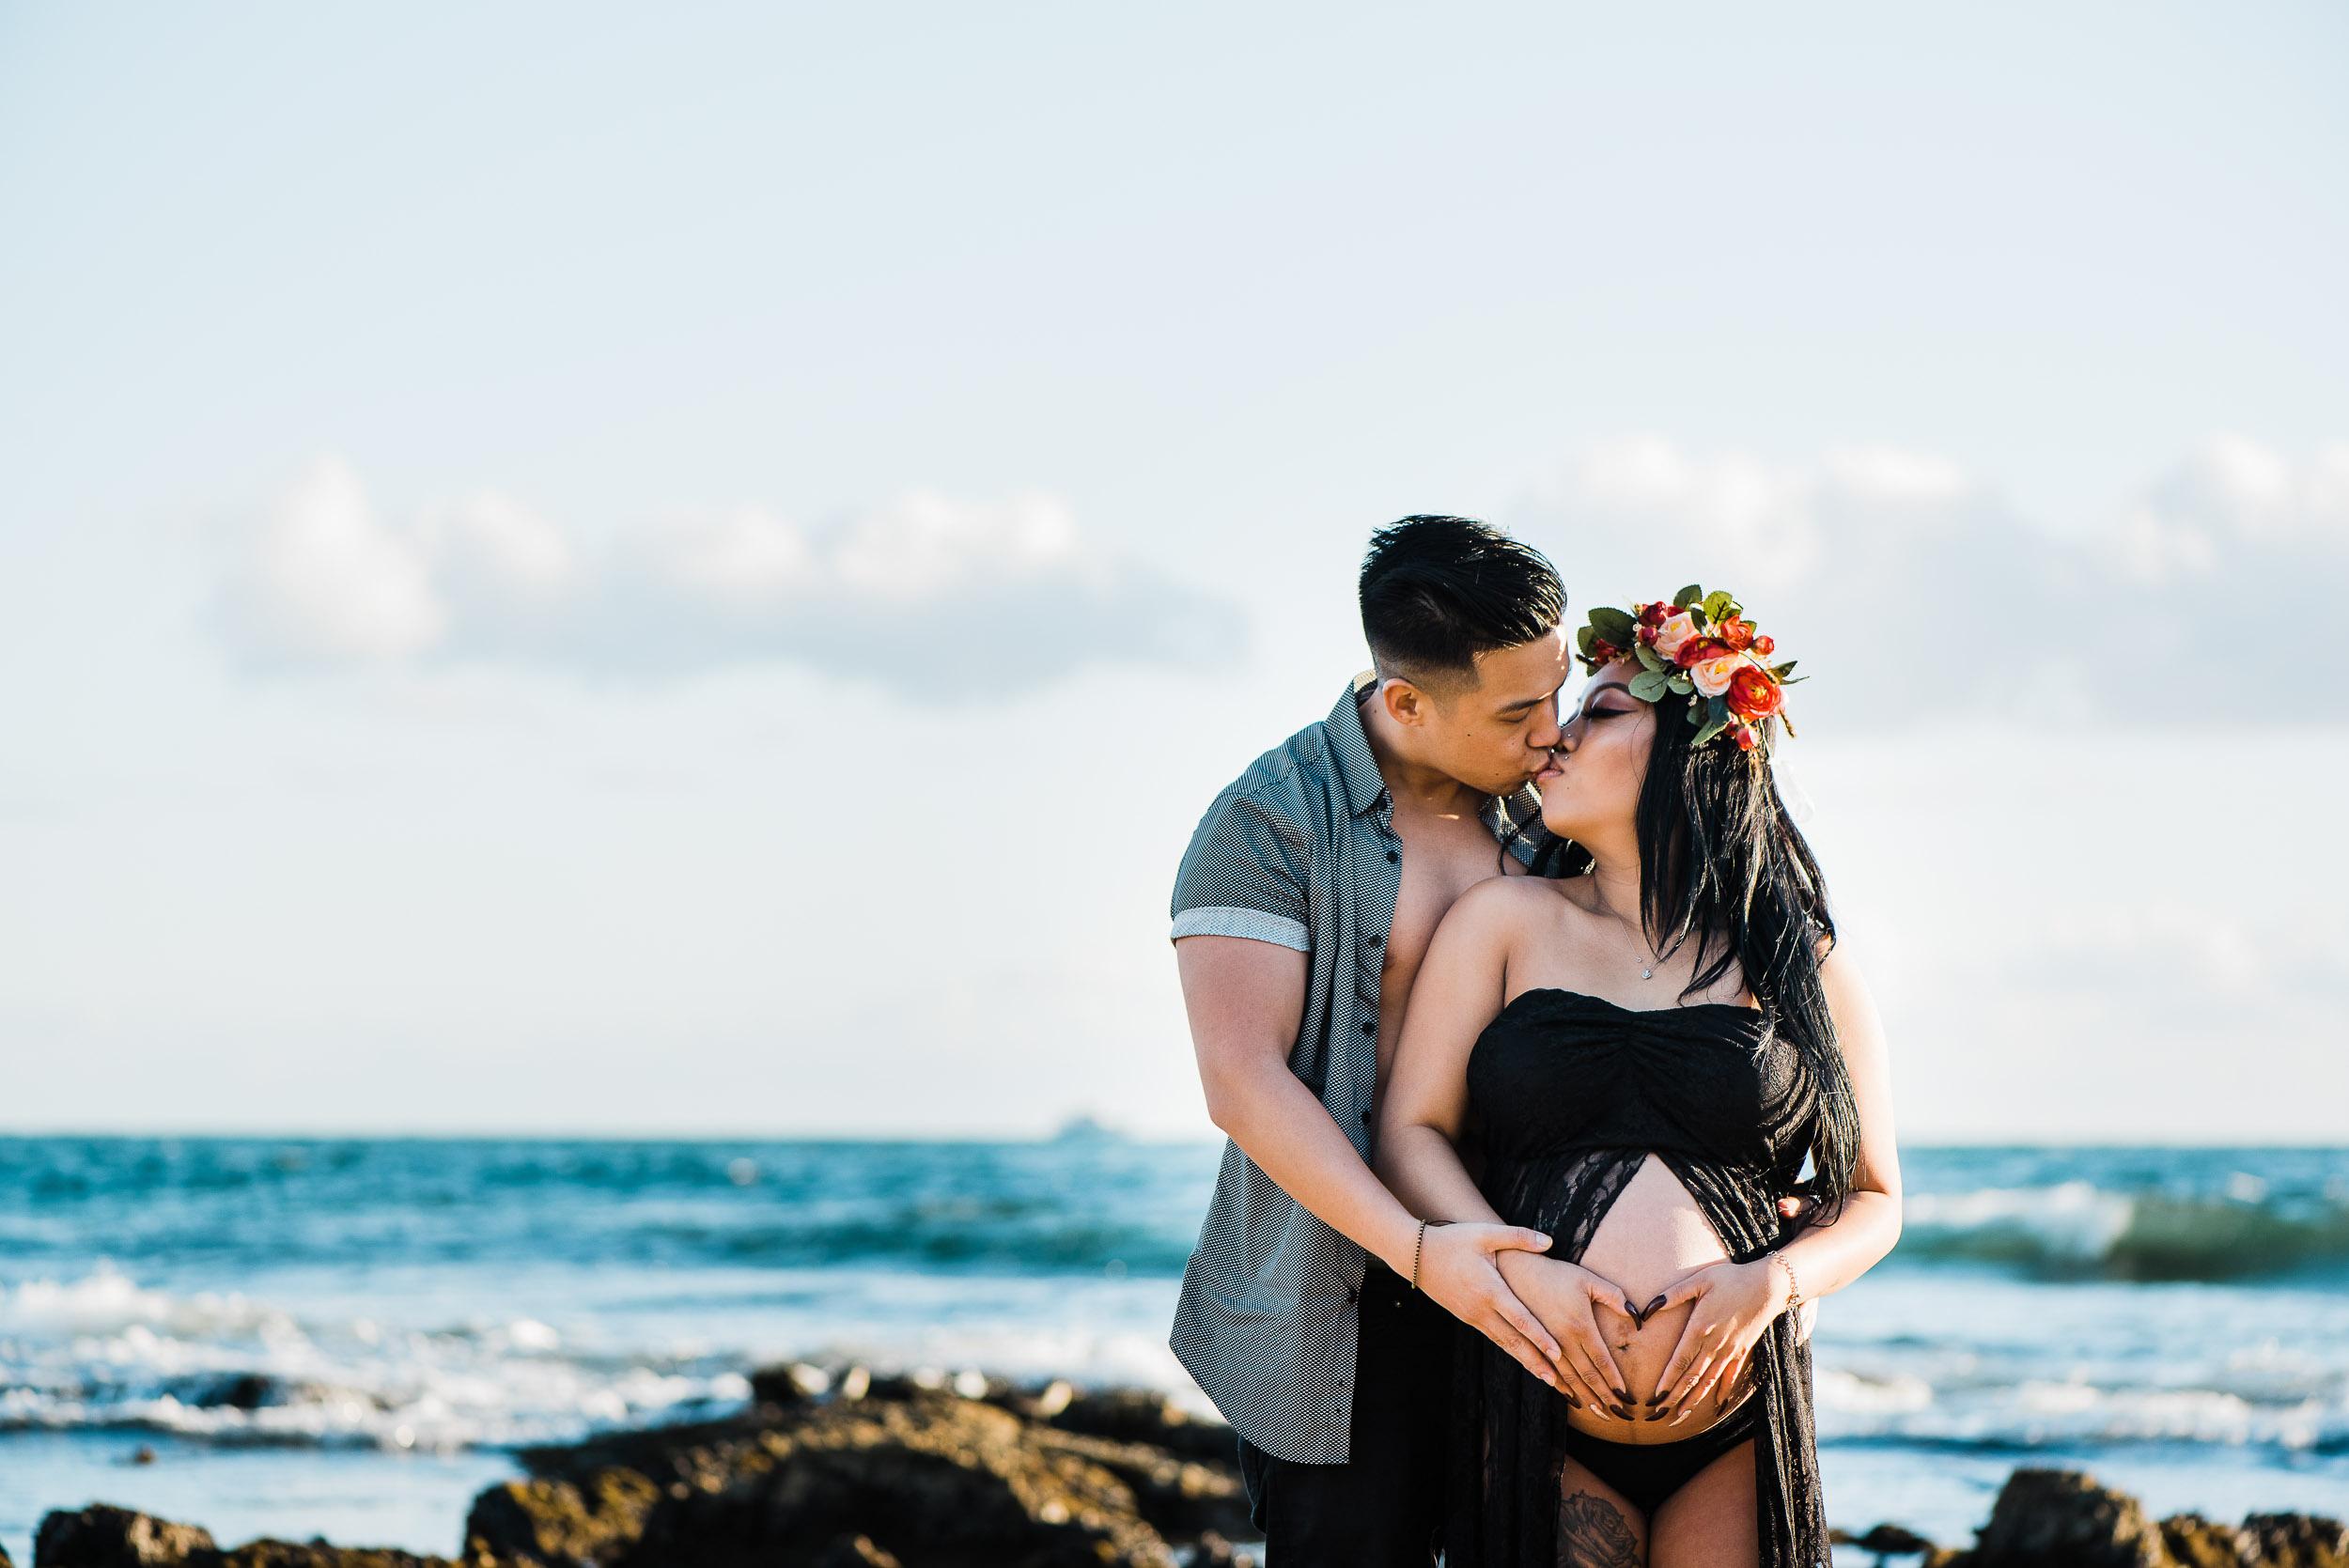 Miraflor-Photo-Peter-Crystal-Maternity-Photoshoot-Newport-Beach-20180317-009.jpg